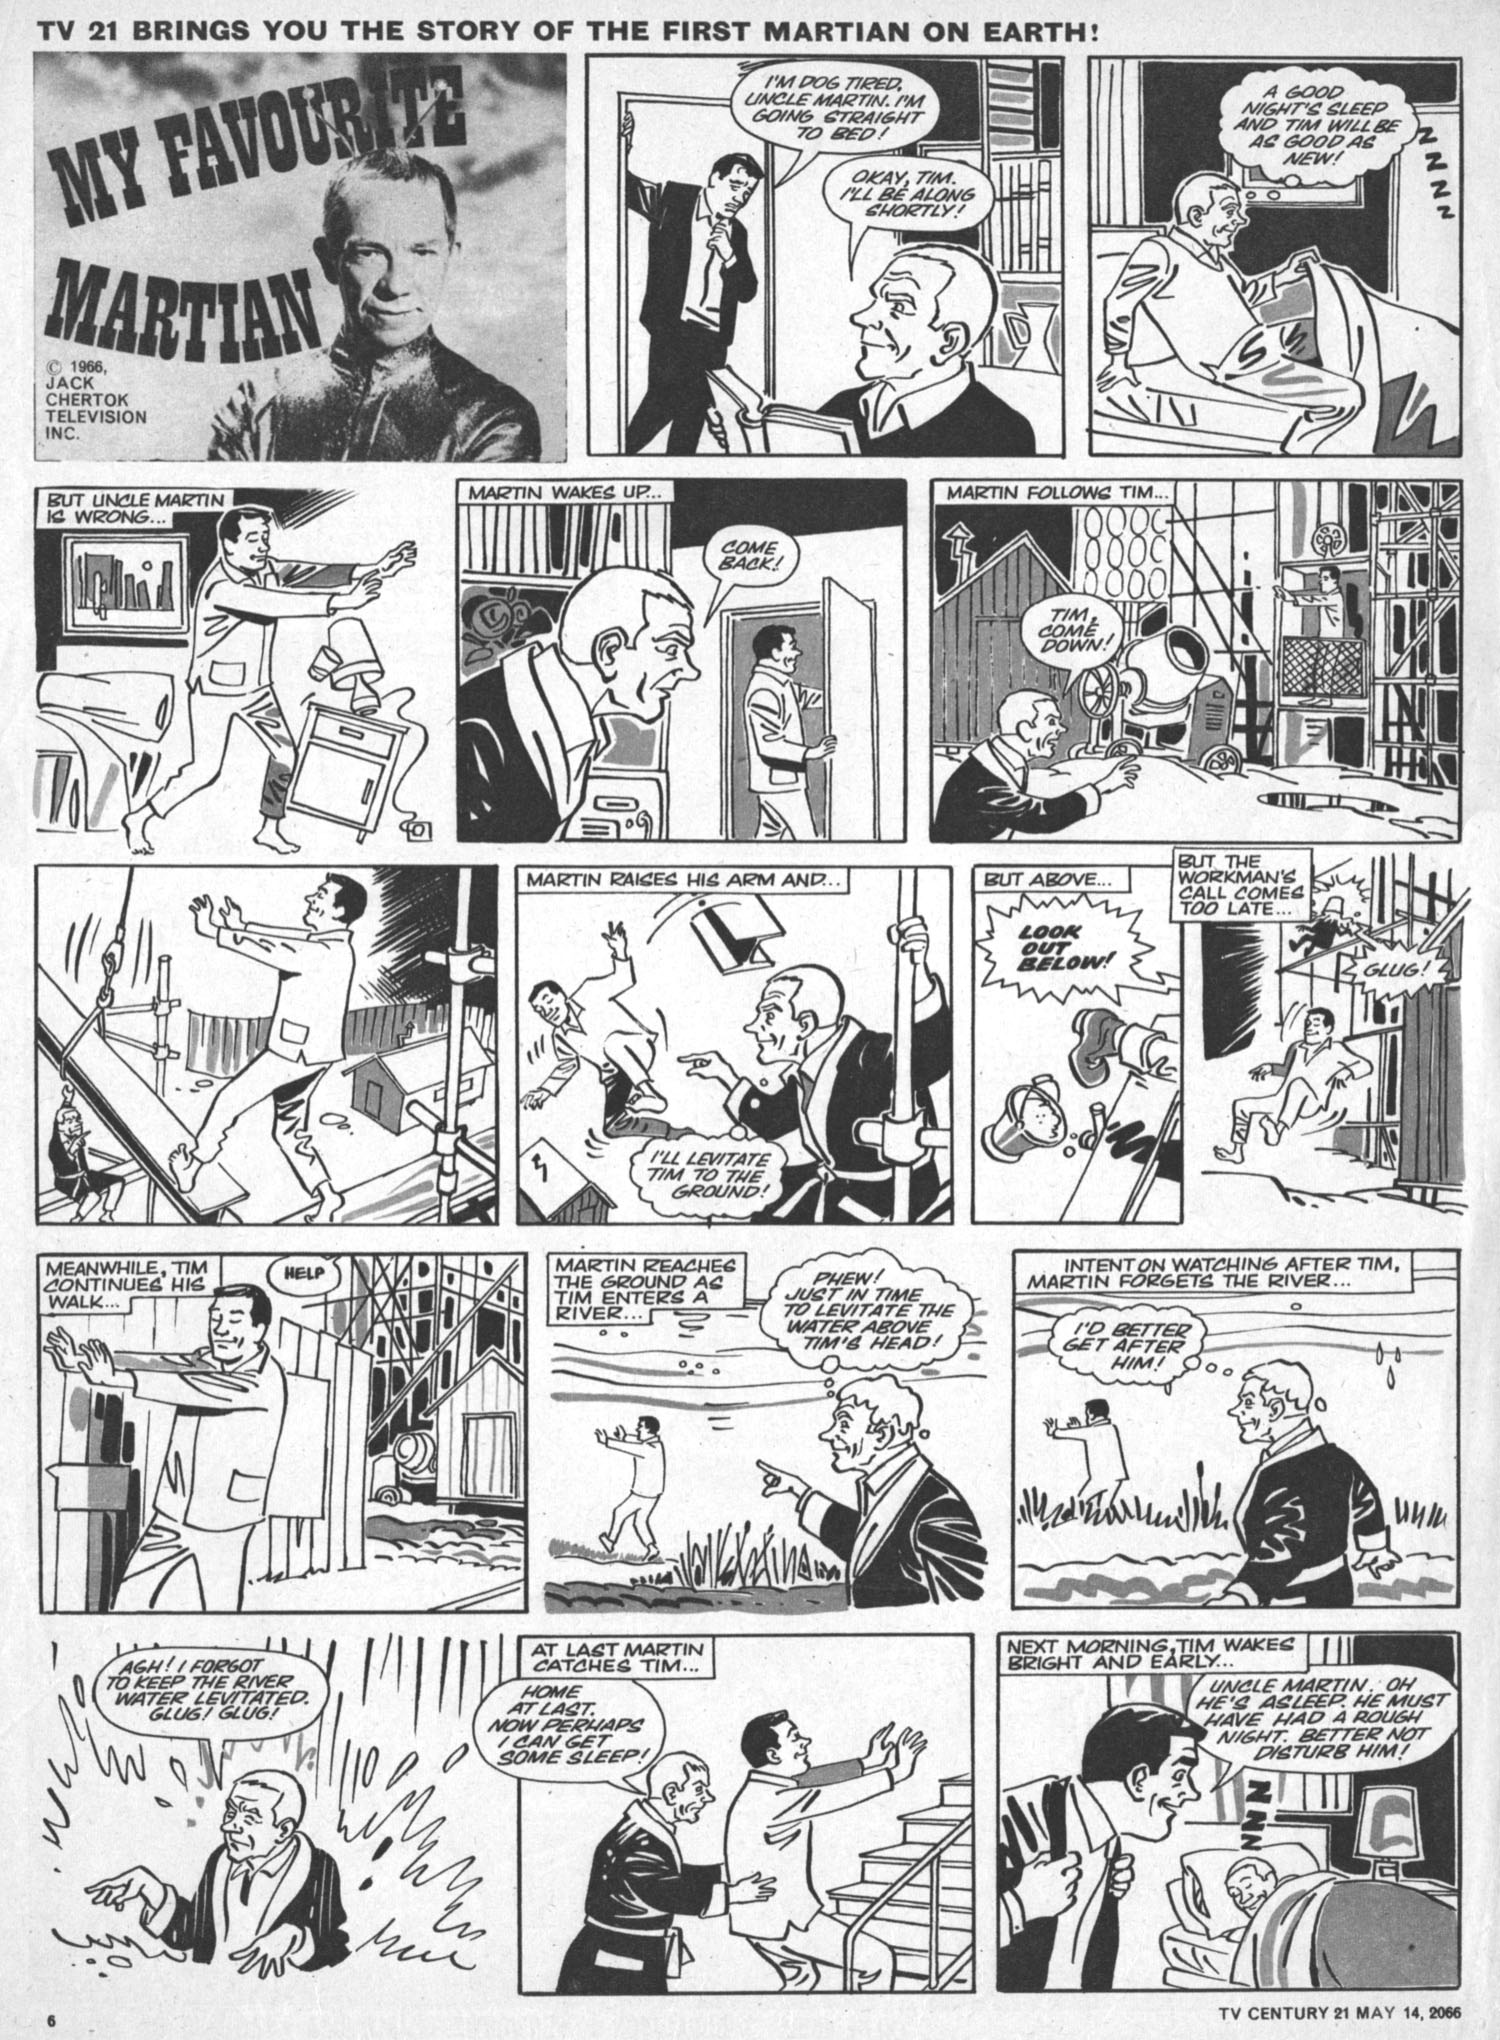 Read online TV Century 21 (TV 21) comic -  Issue #69 - 6